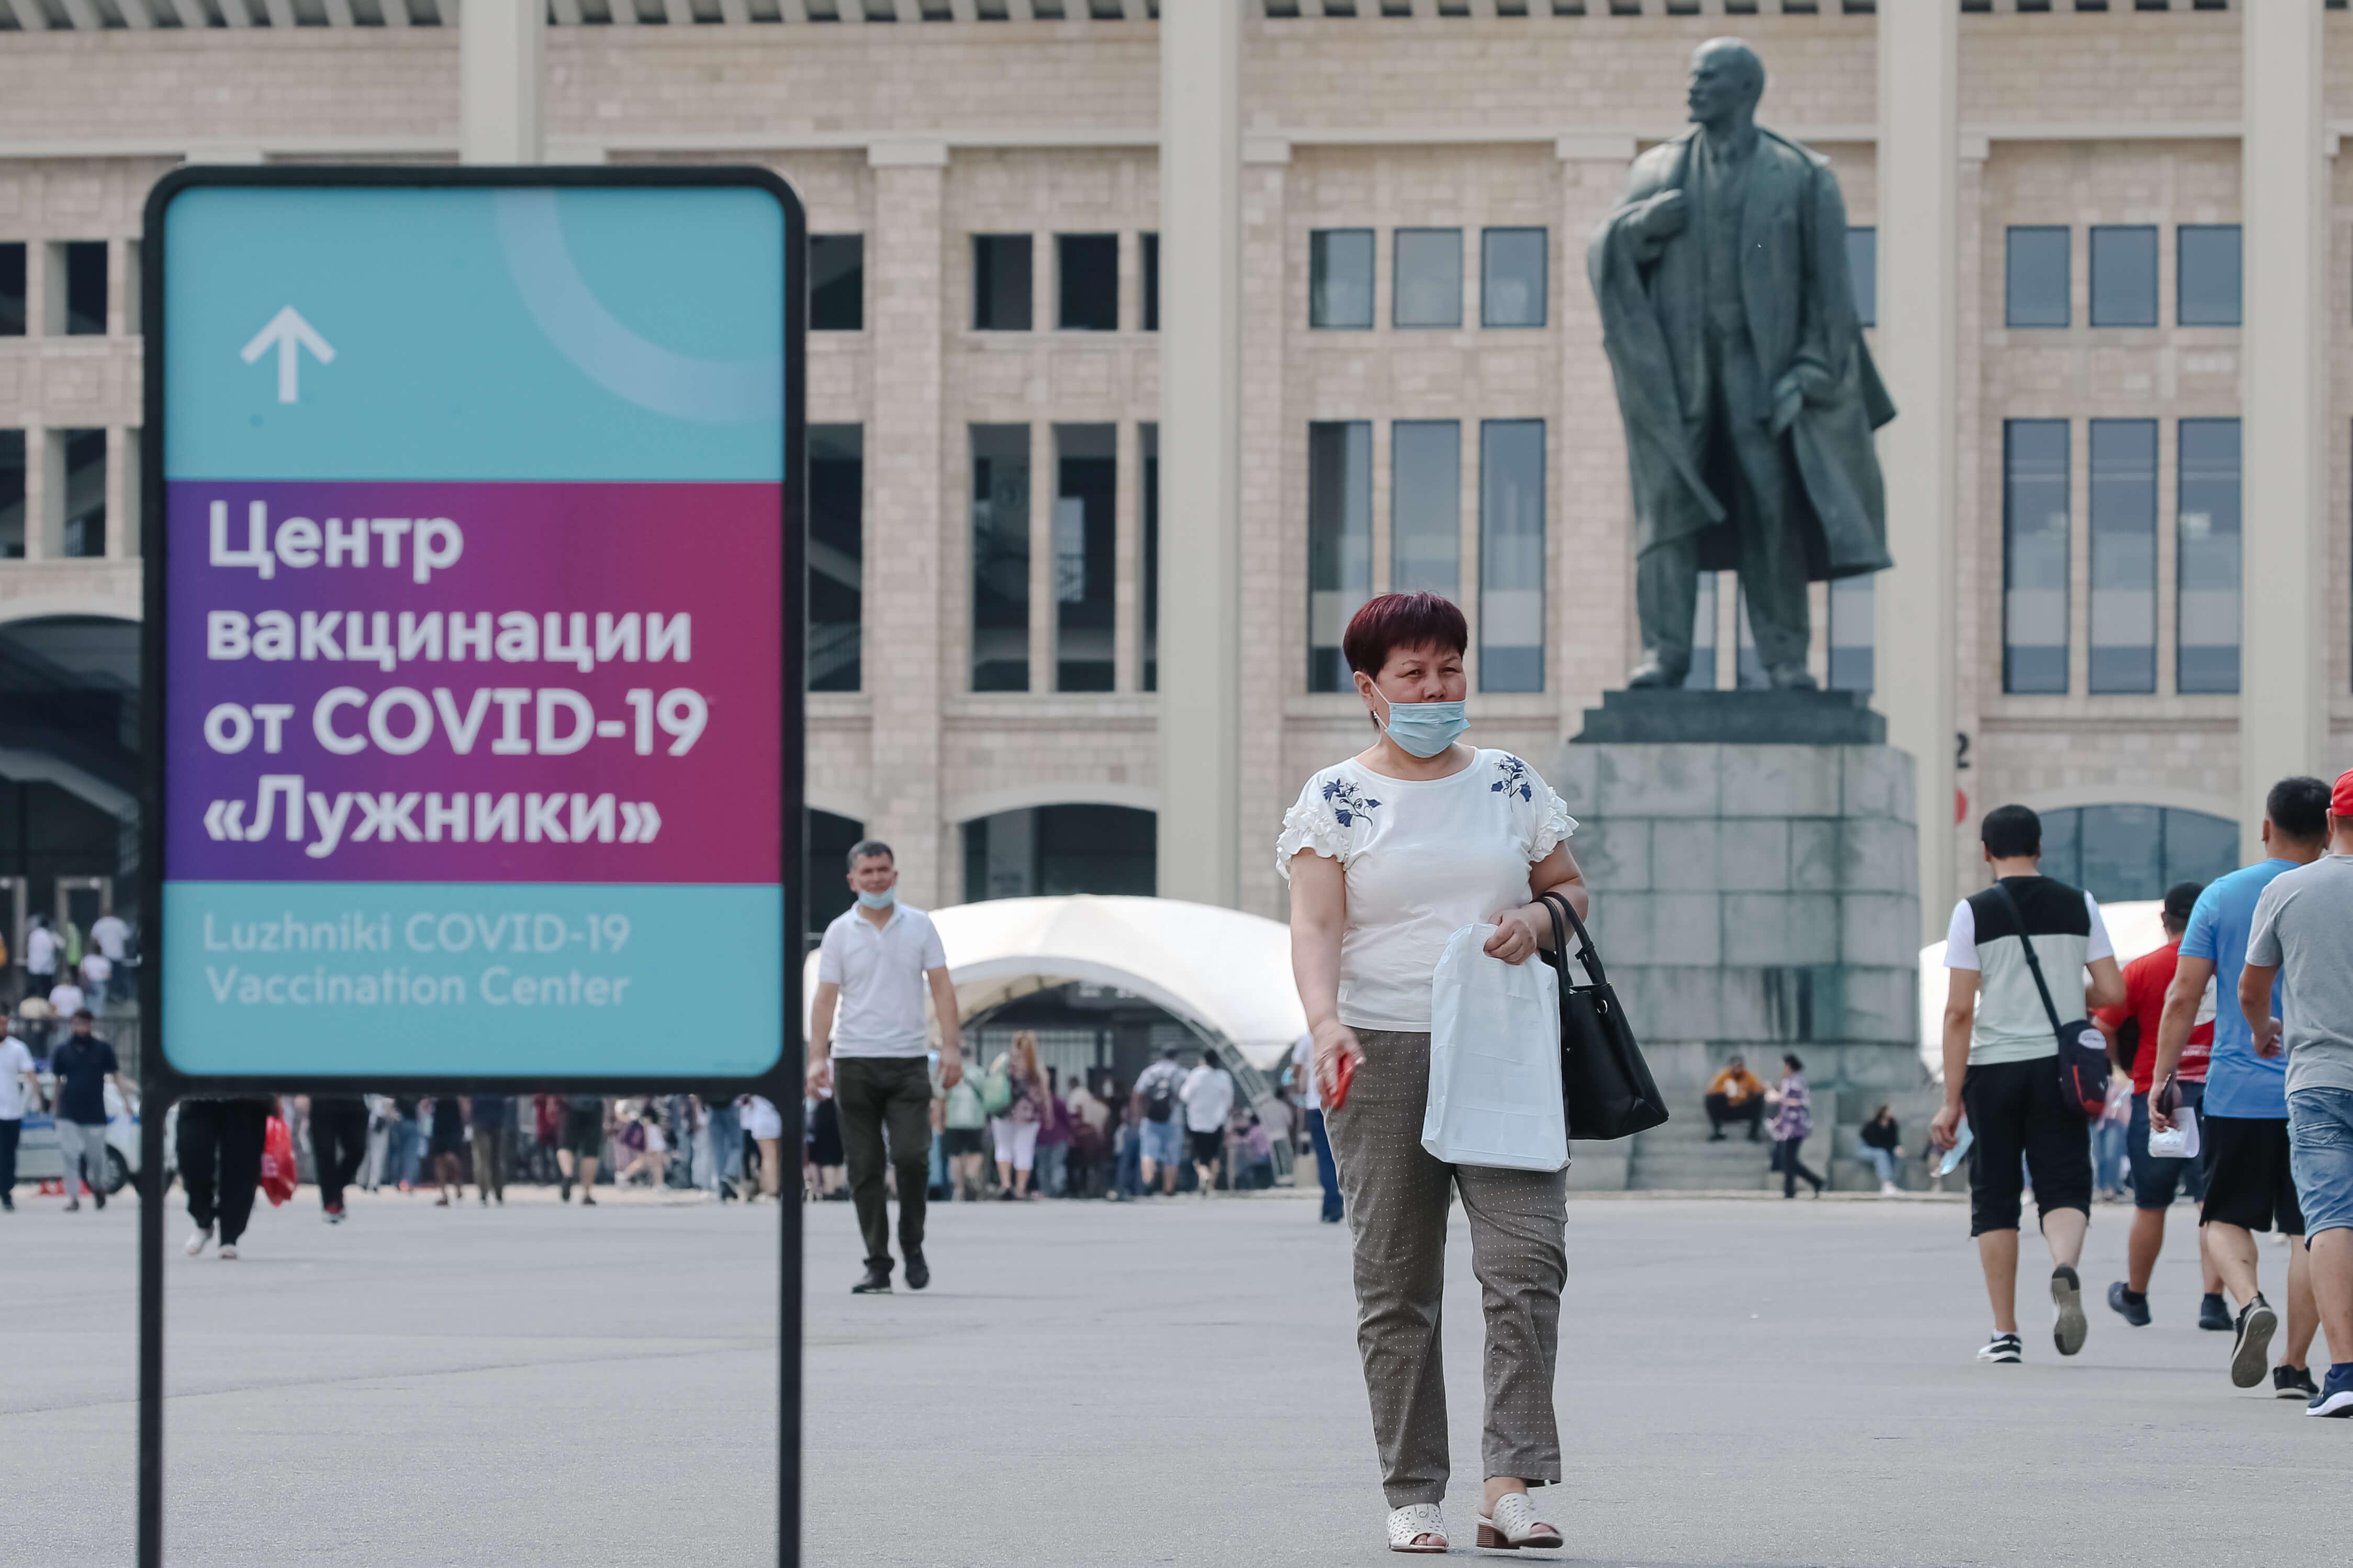 Evgeny SinitsynyXinHua Global Look press